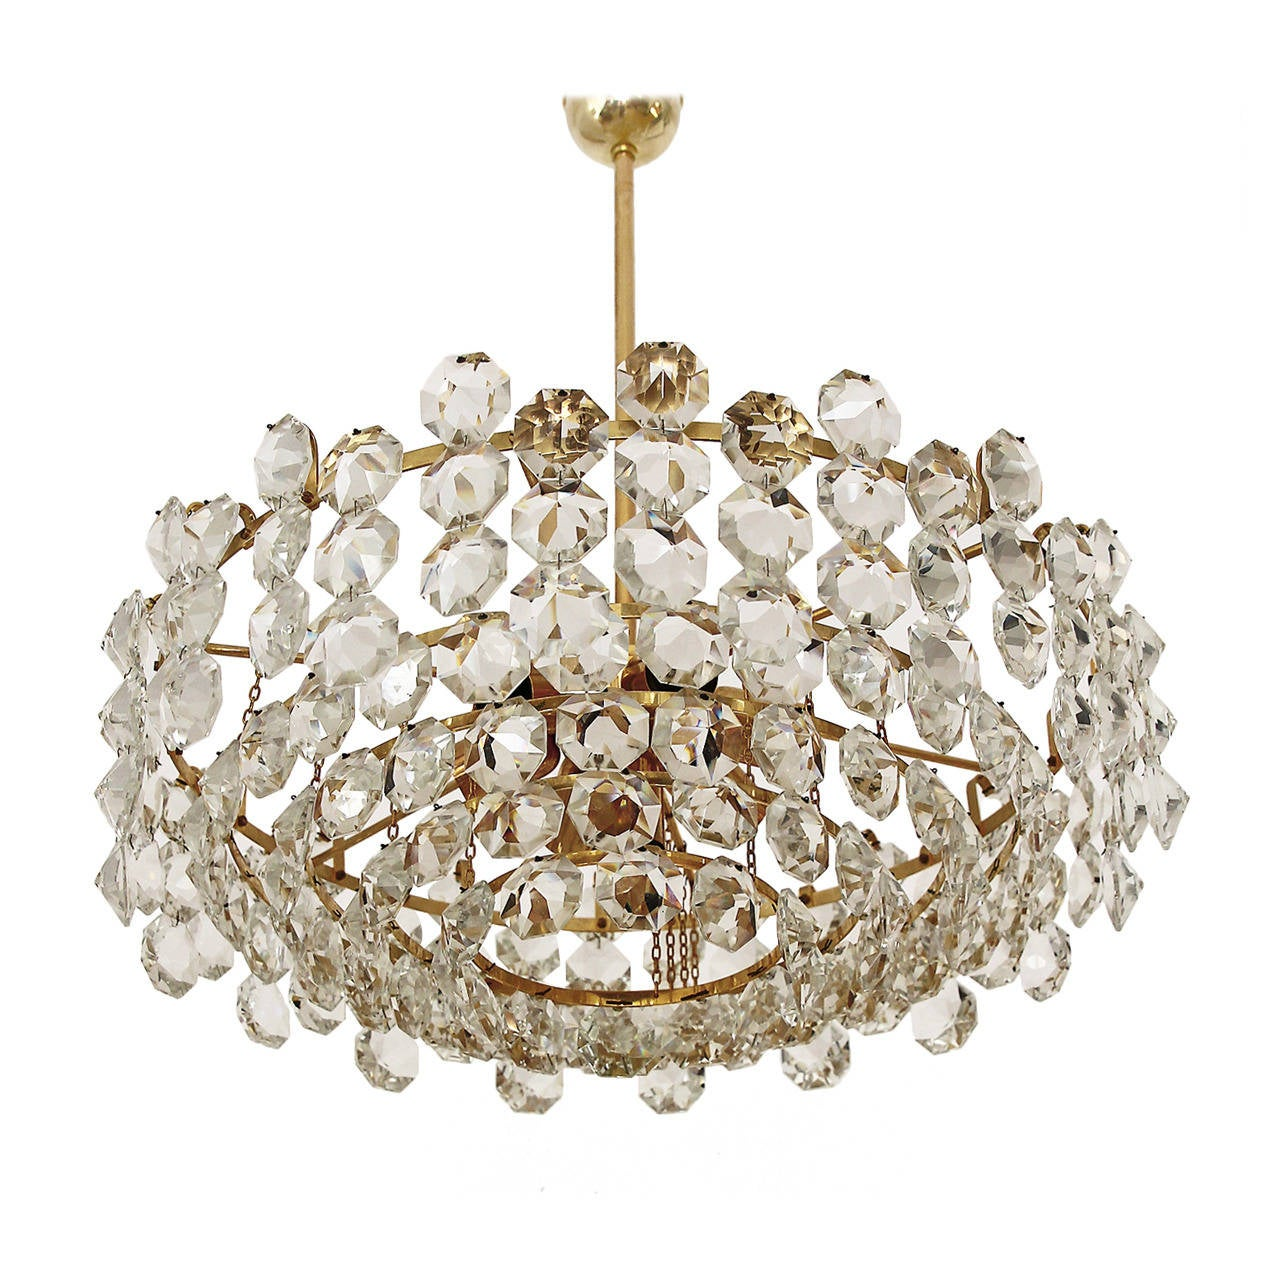 Sicilian crystal ship chandelier for sale at 1stdibs arubaitofo Choice Image